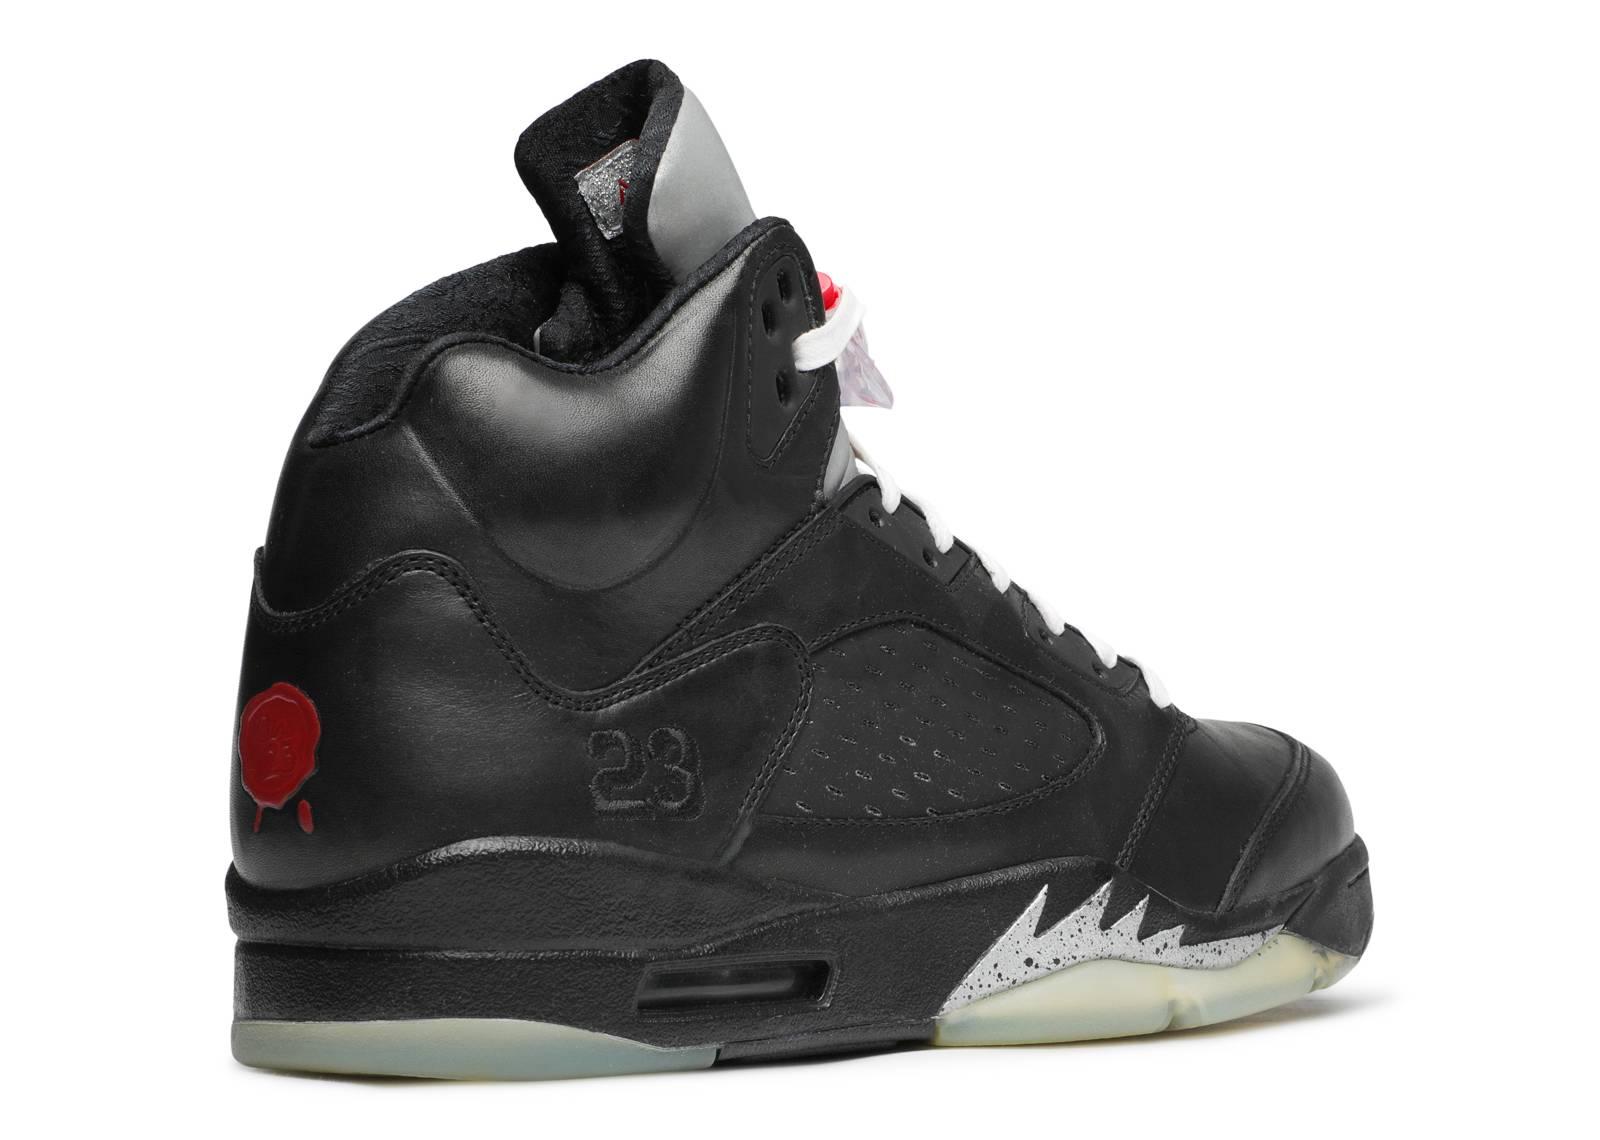 best sneakers 843e8 1ee4b Air Jordan 5 Retro Premio